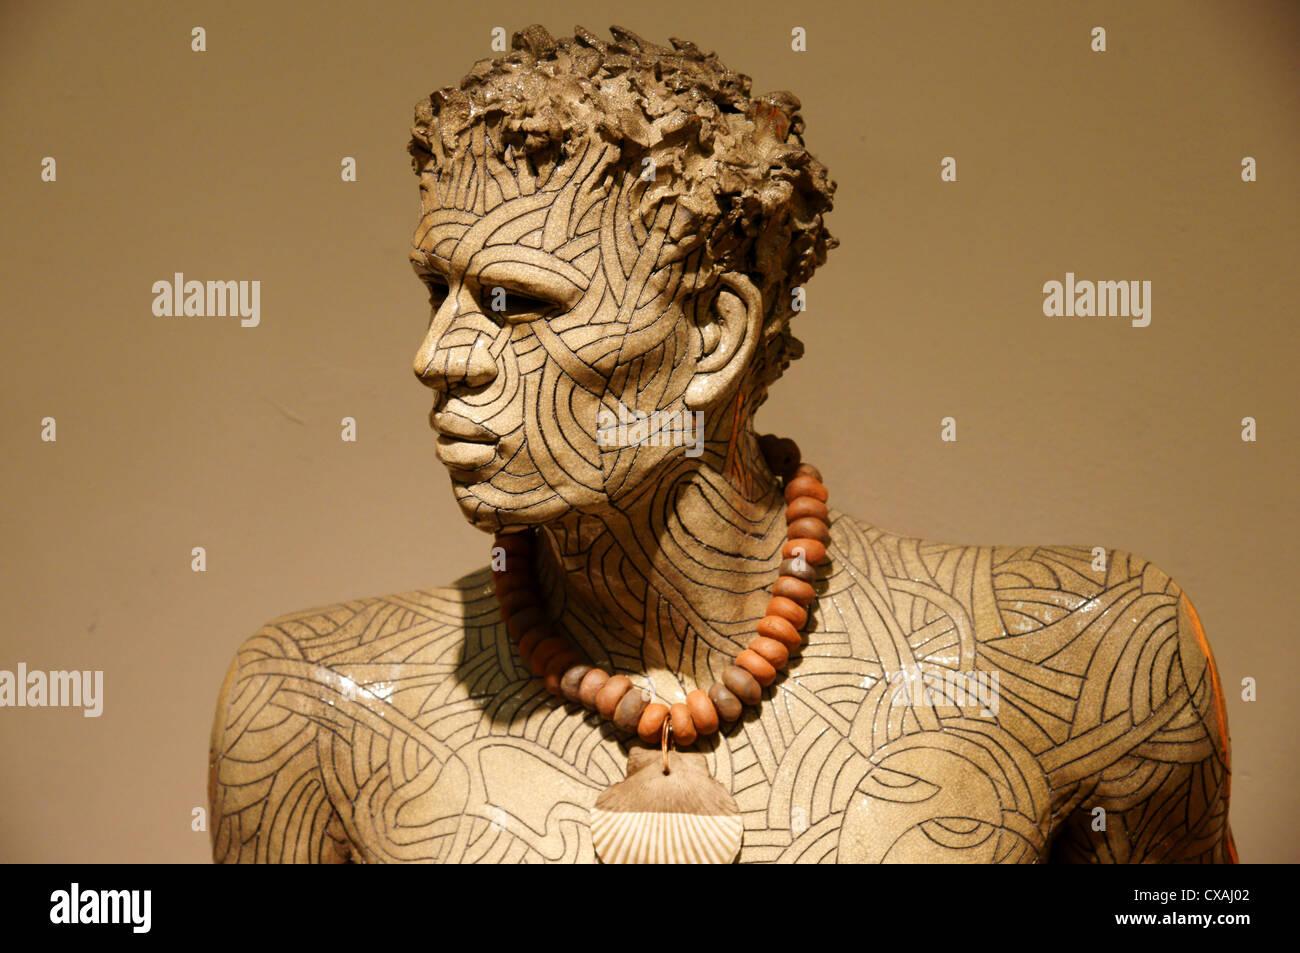 art ceramic man male figure cut disfigured plaza mercado santa fe new mexico nm god disfigurement aptitude - Stock Image